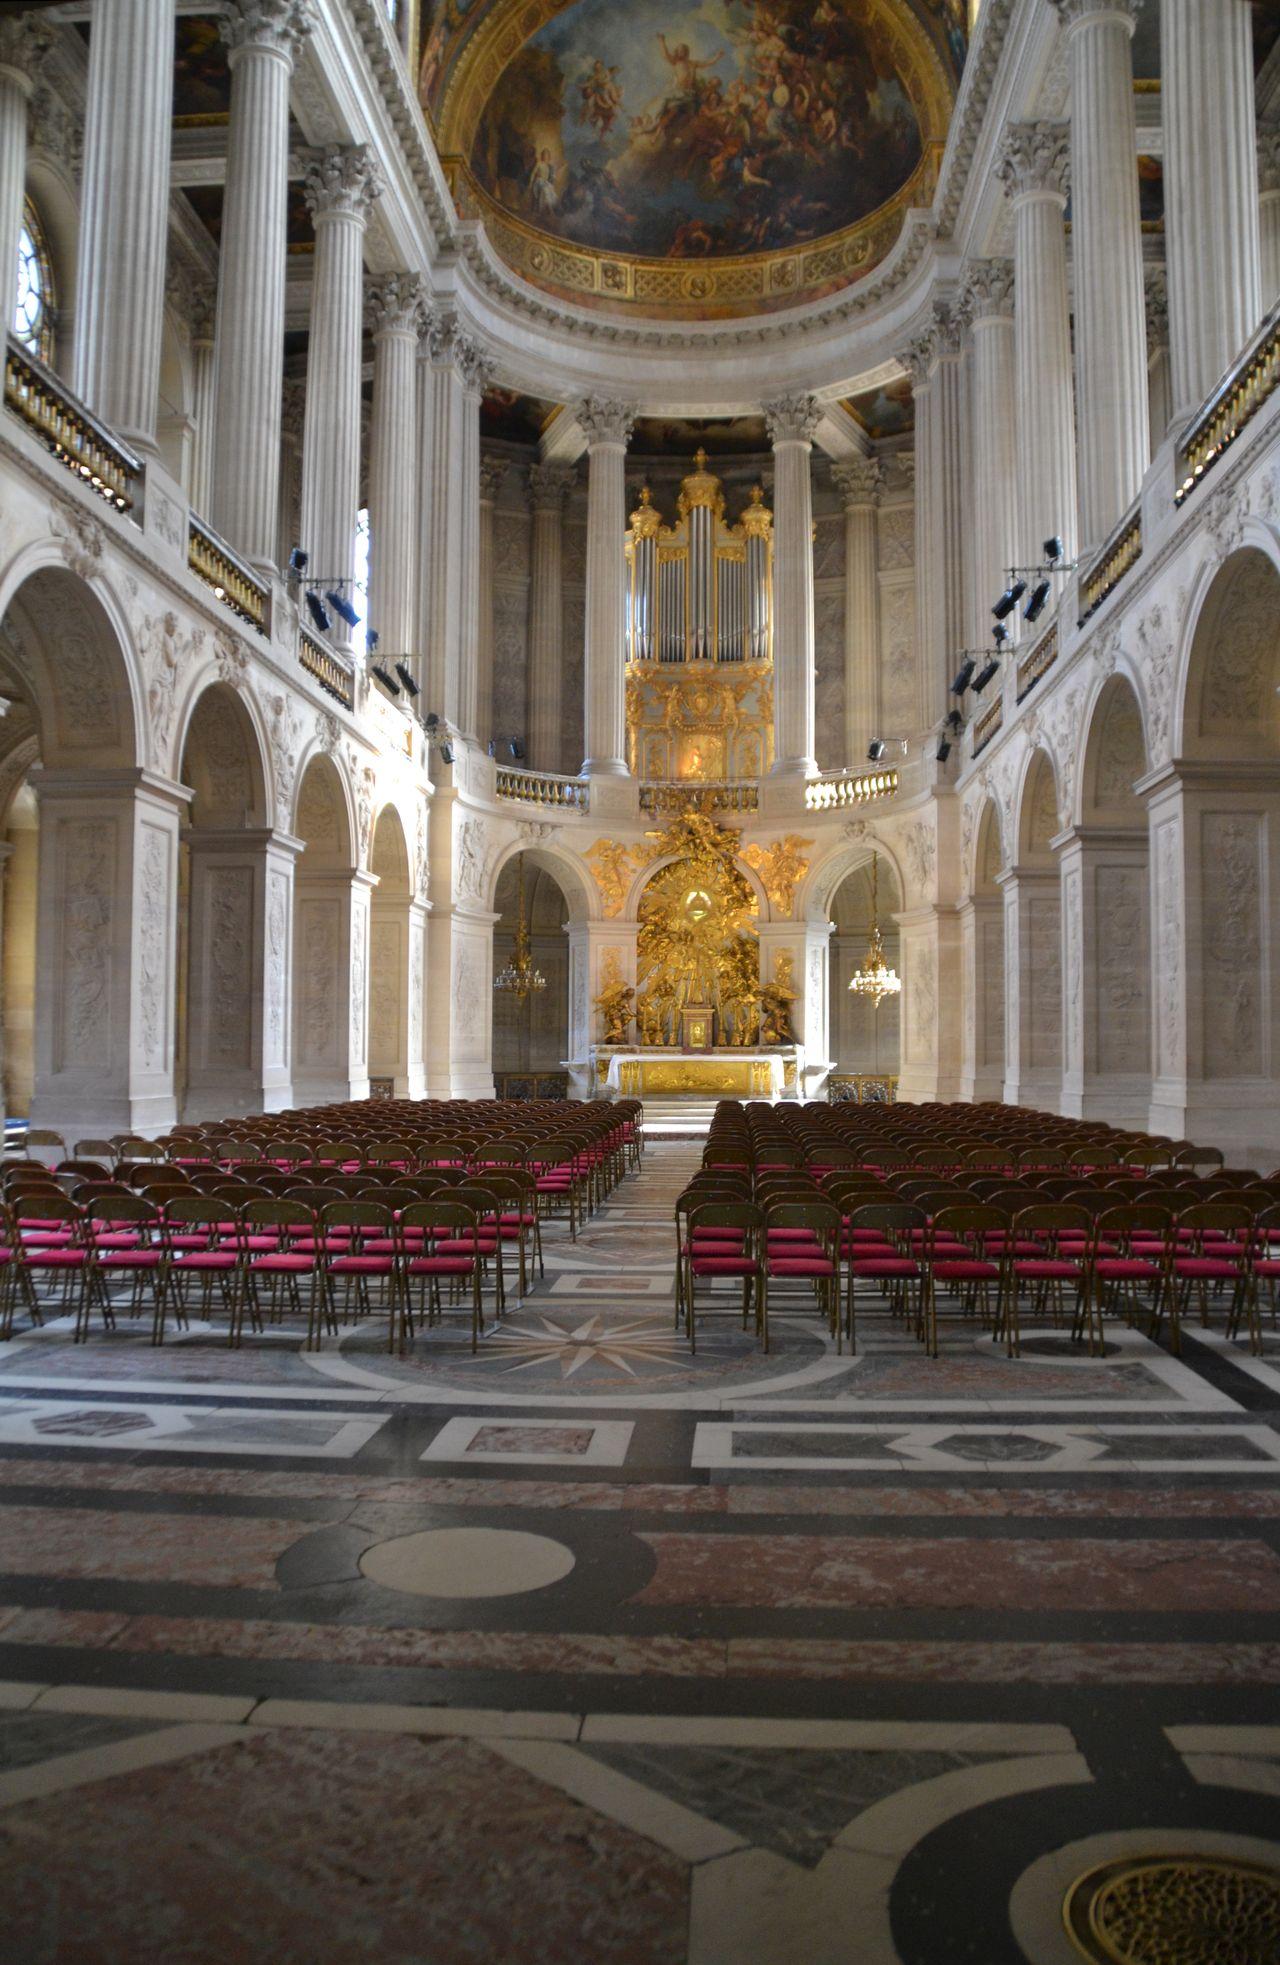 Versailles-i kastély templom